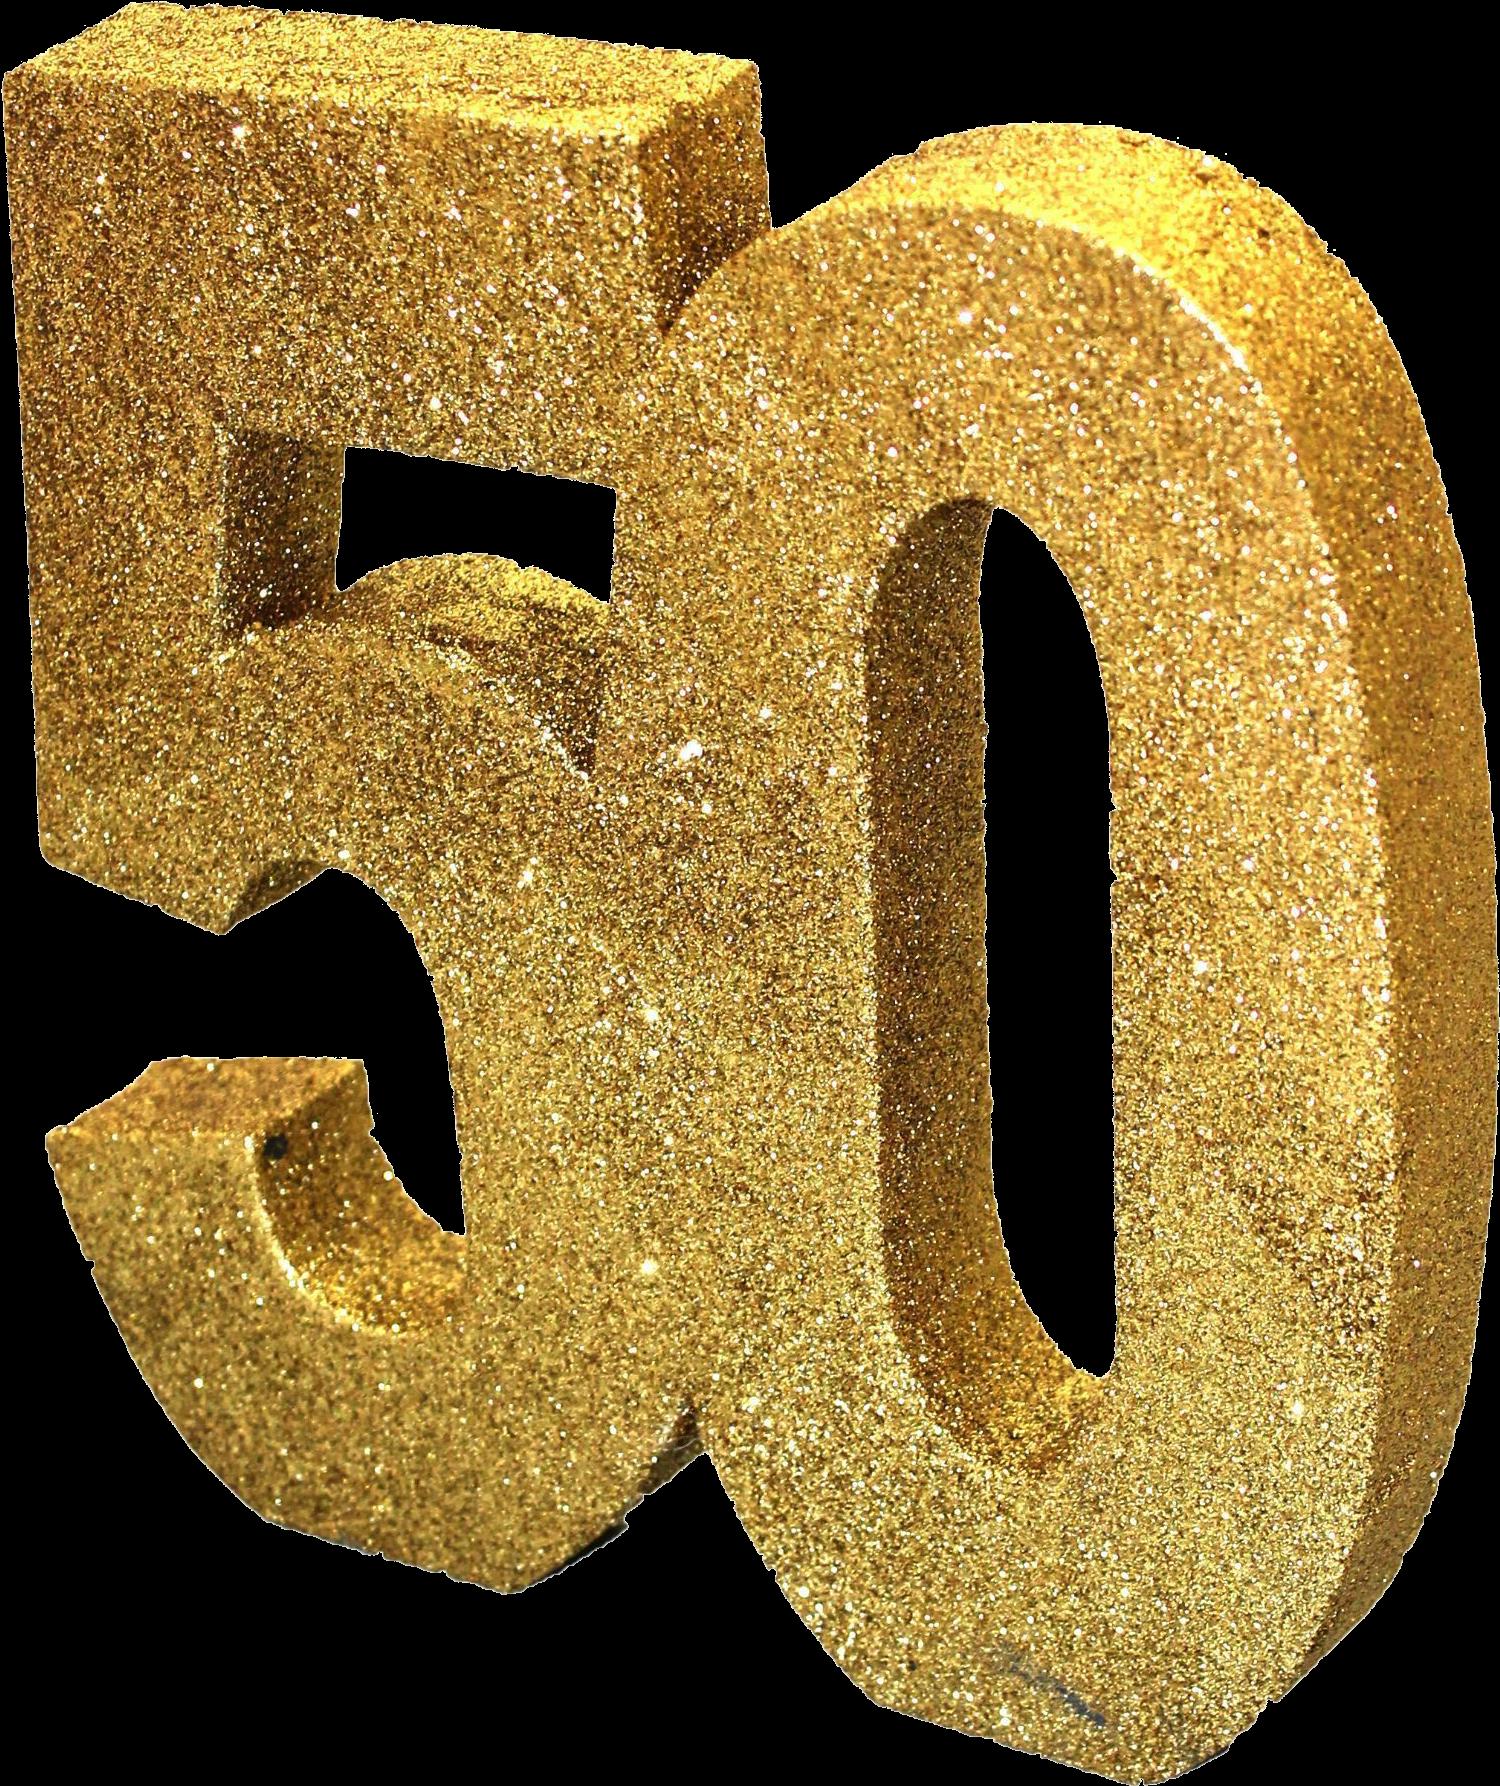 Открытки с цифрой 50